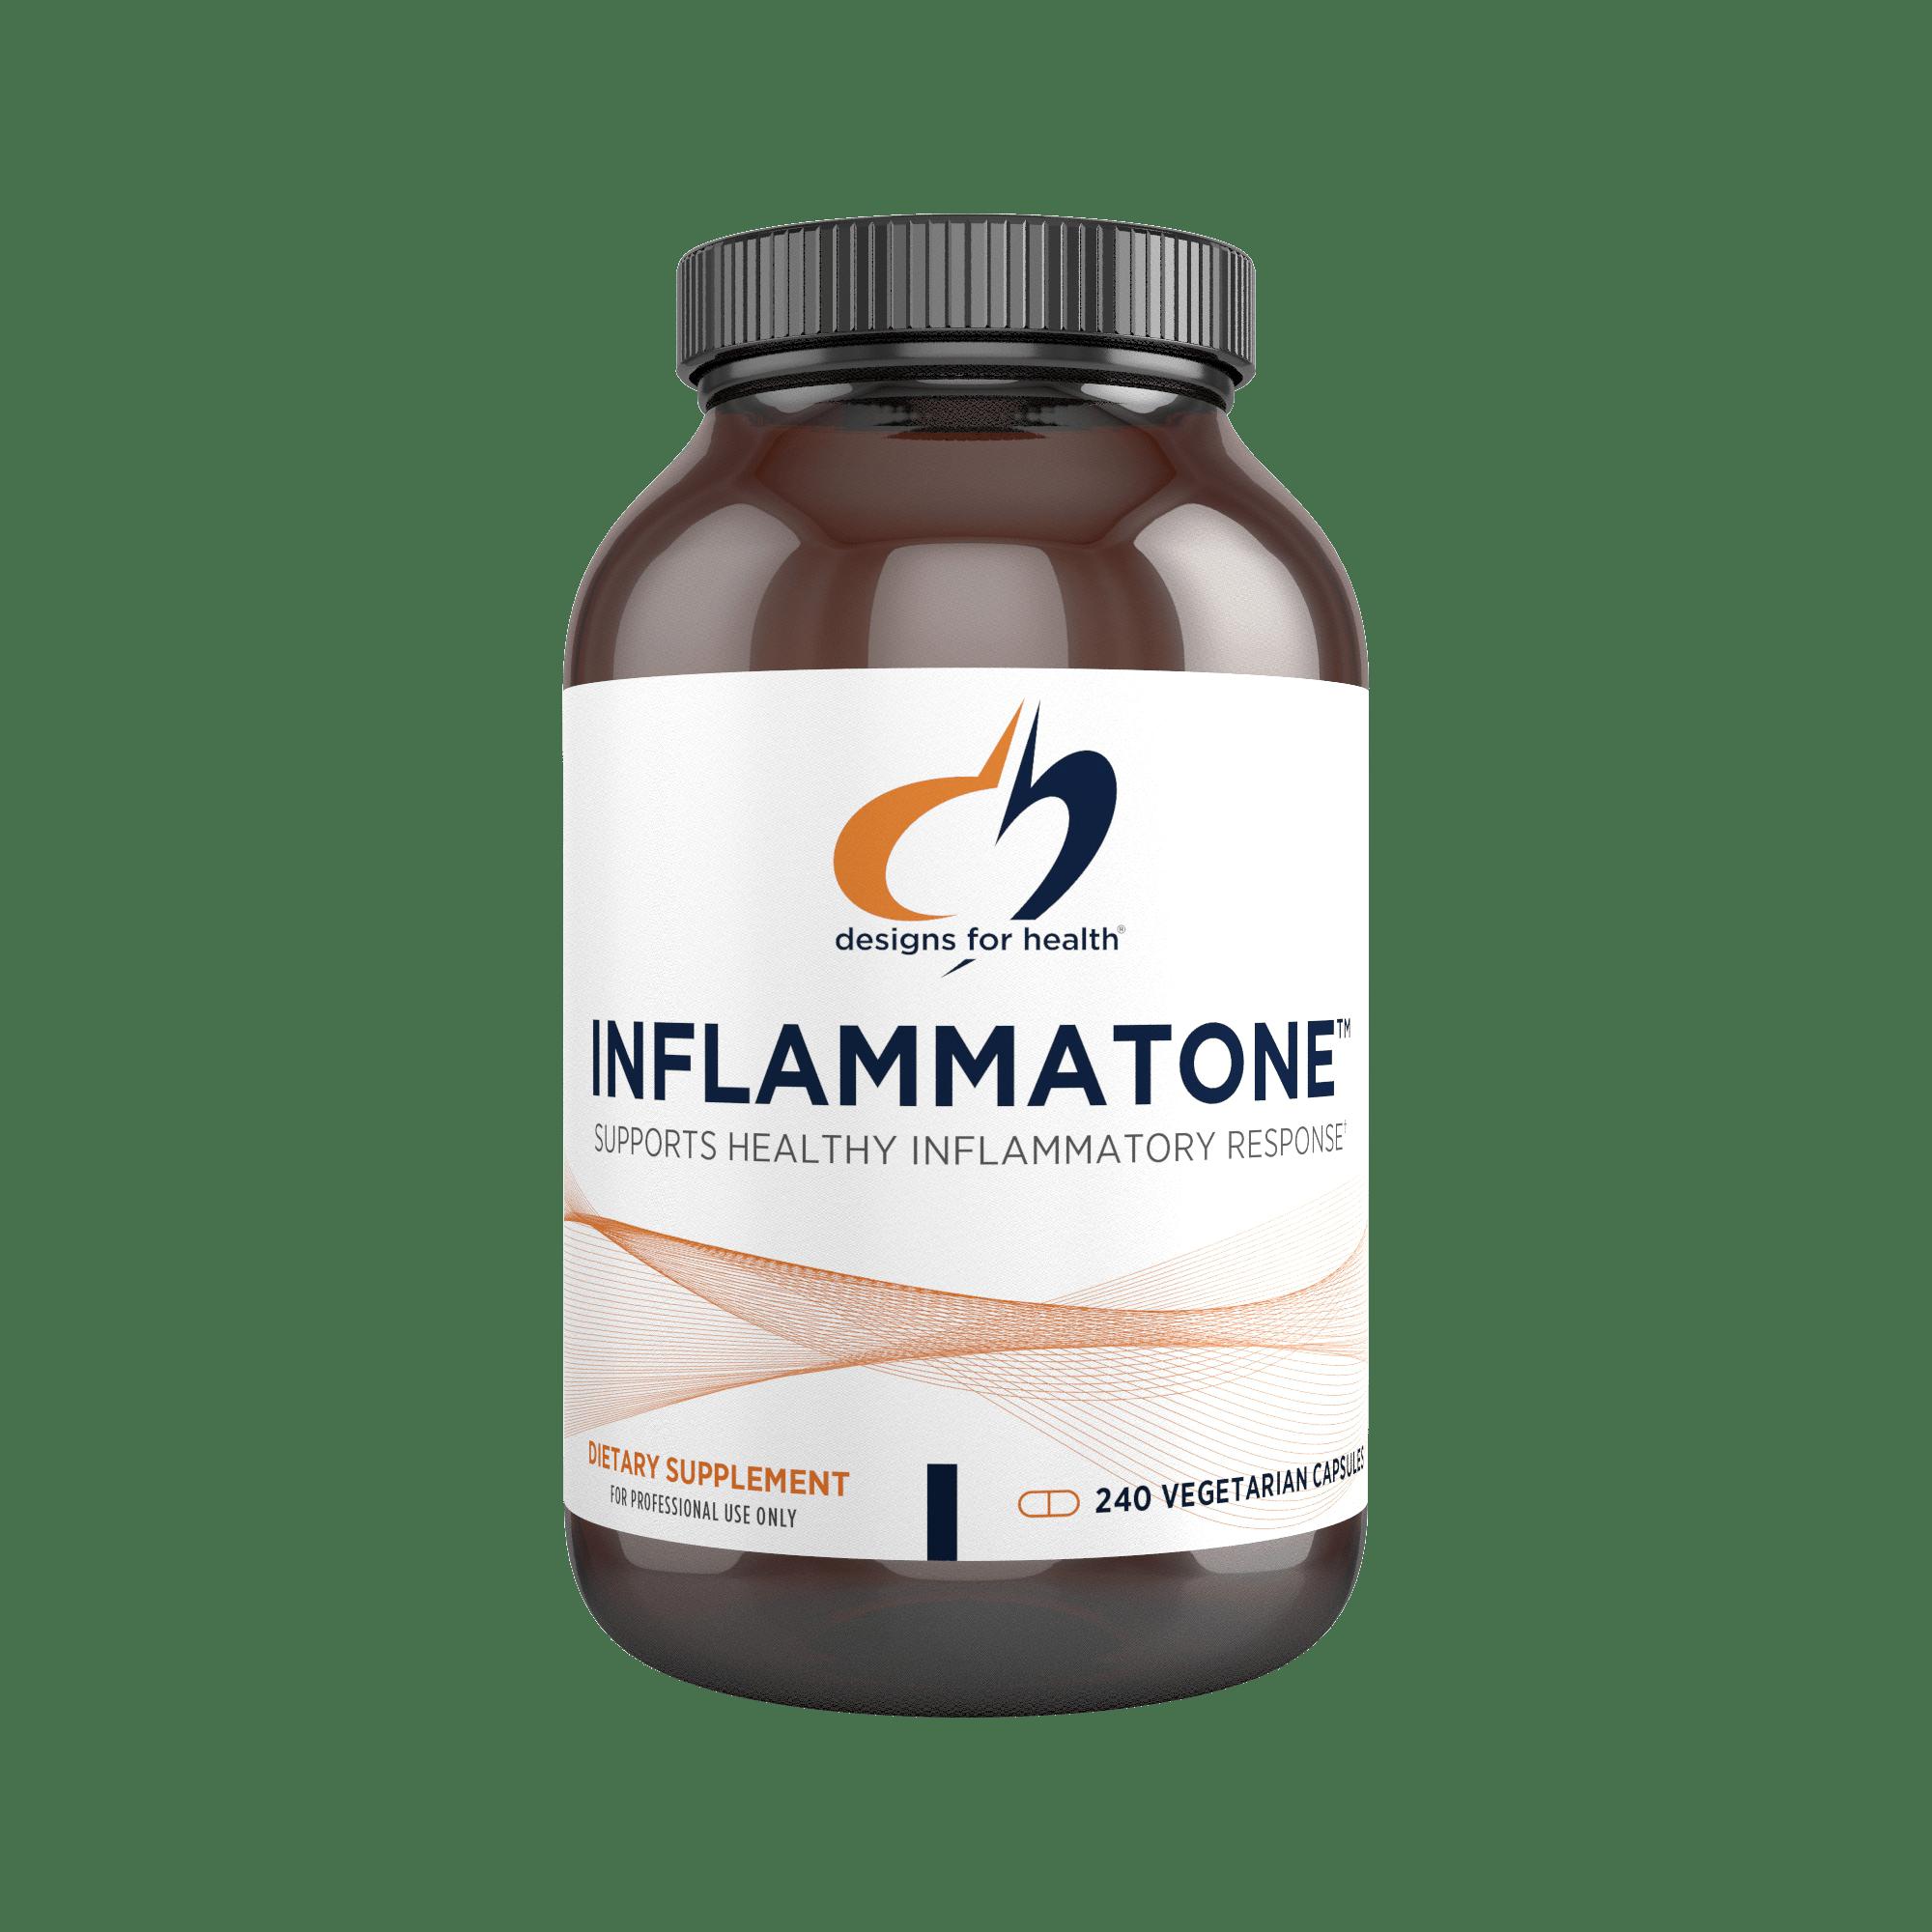 Inflammatone 240 Designs for Health